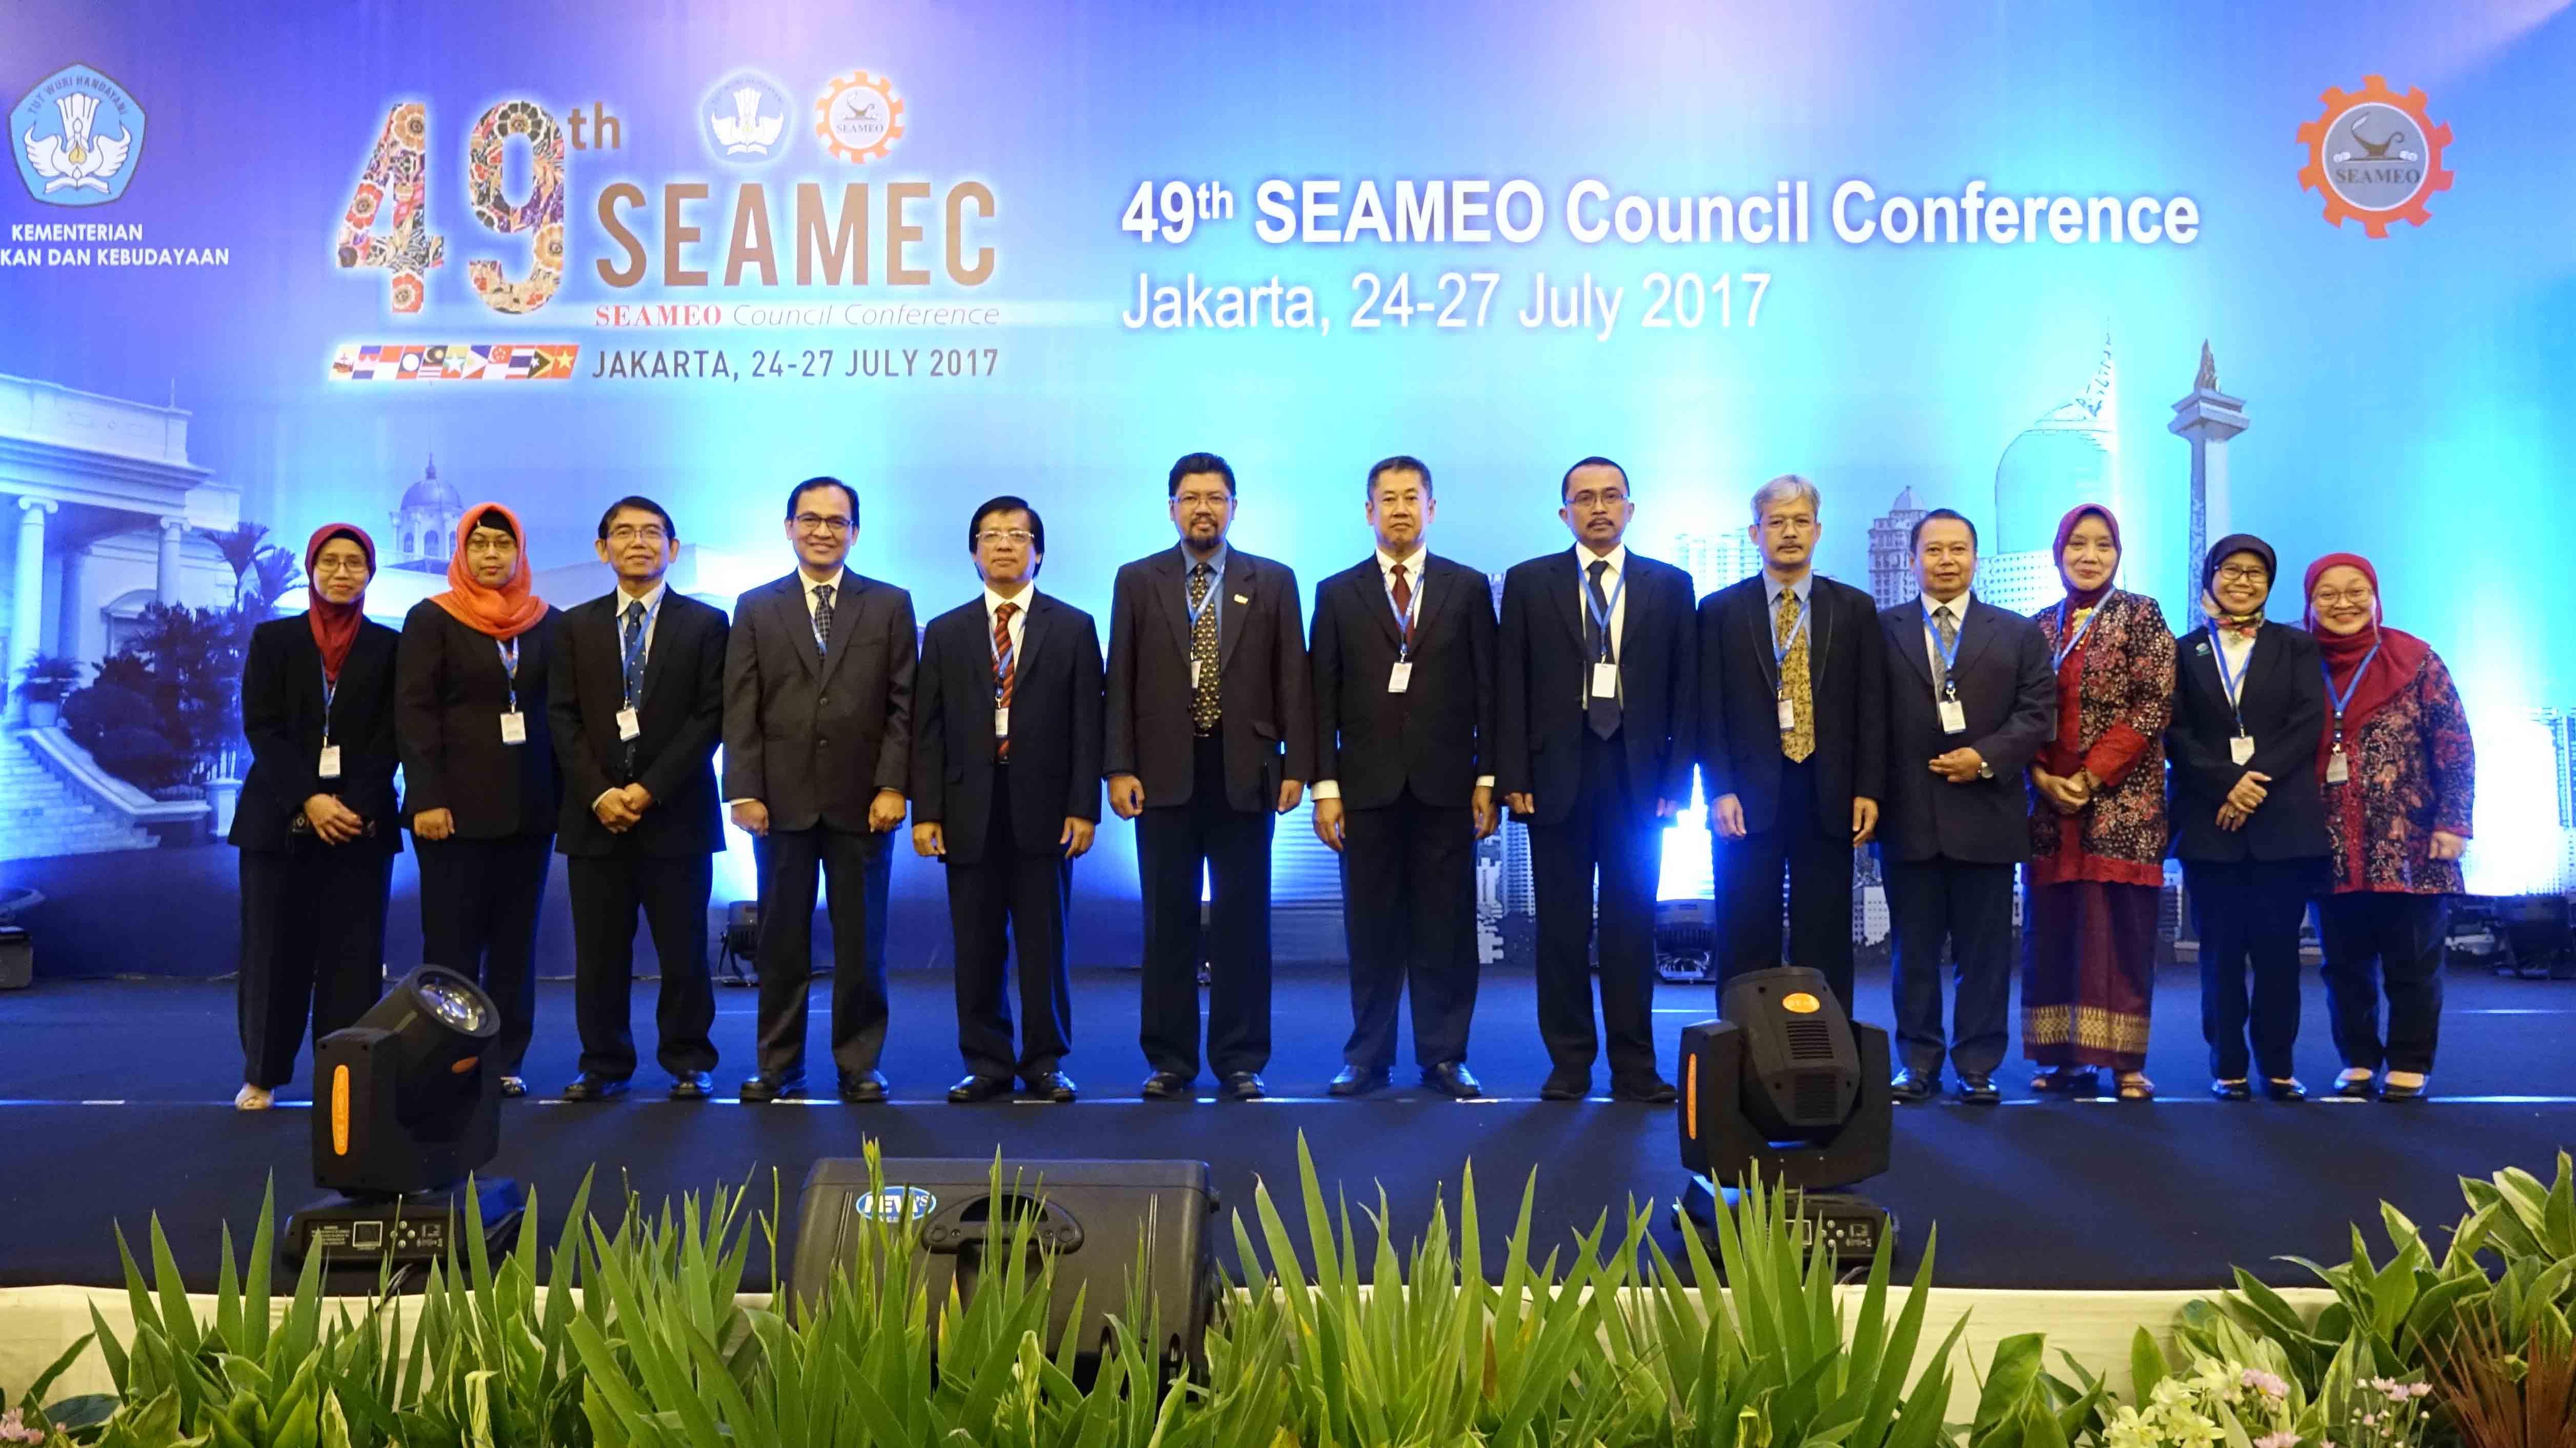 THE 49th SEAMEO Council Conference